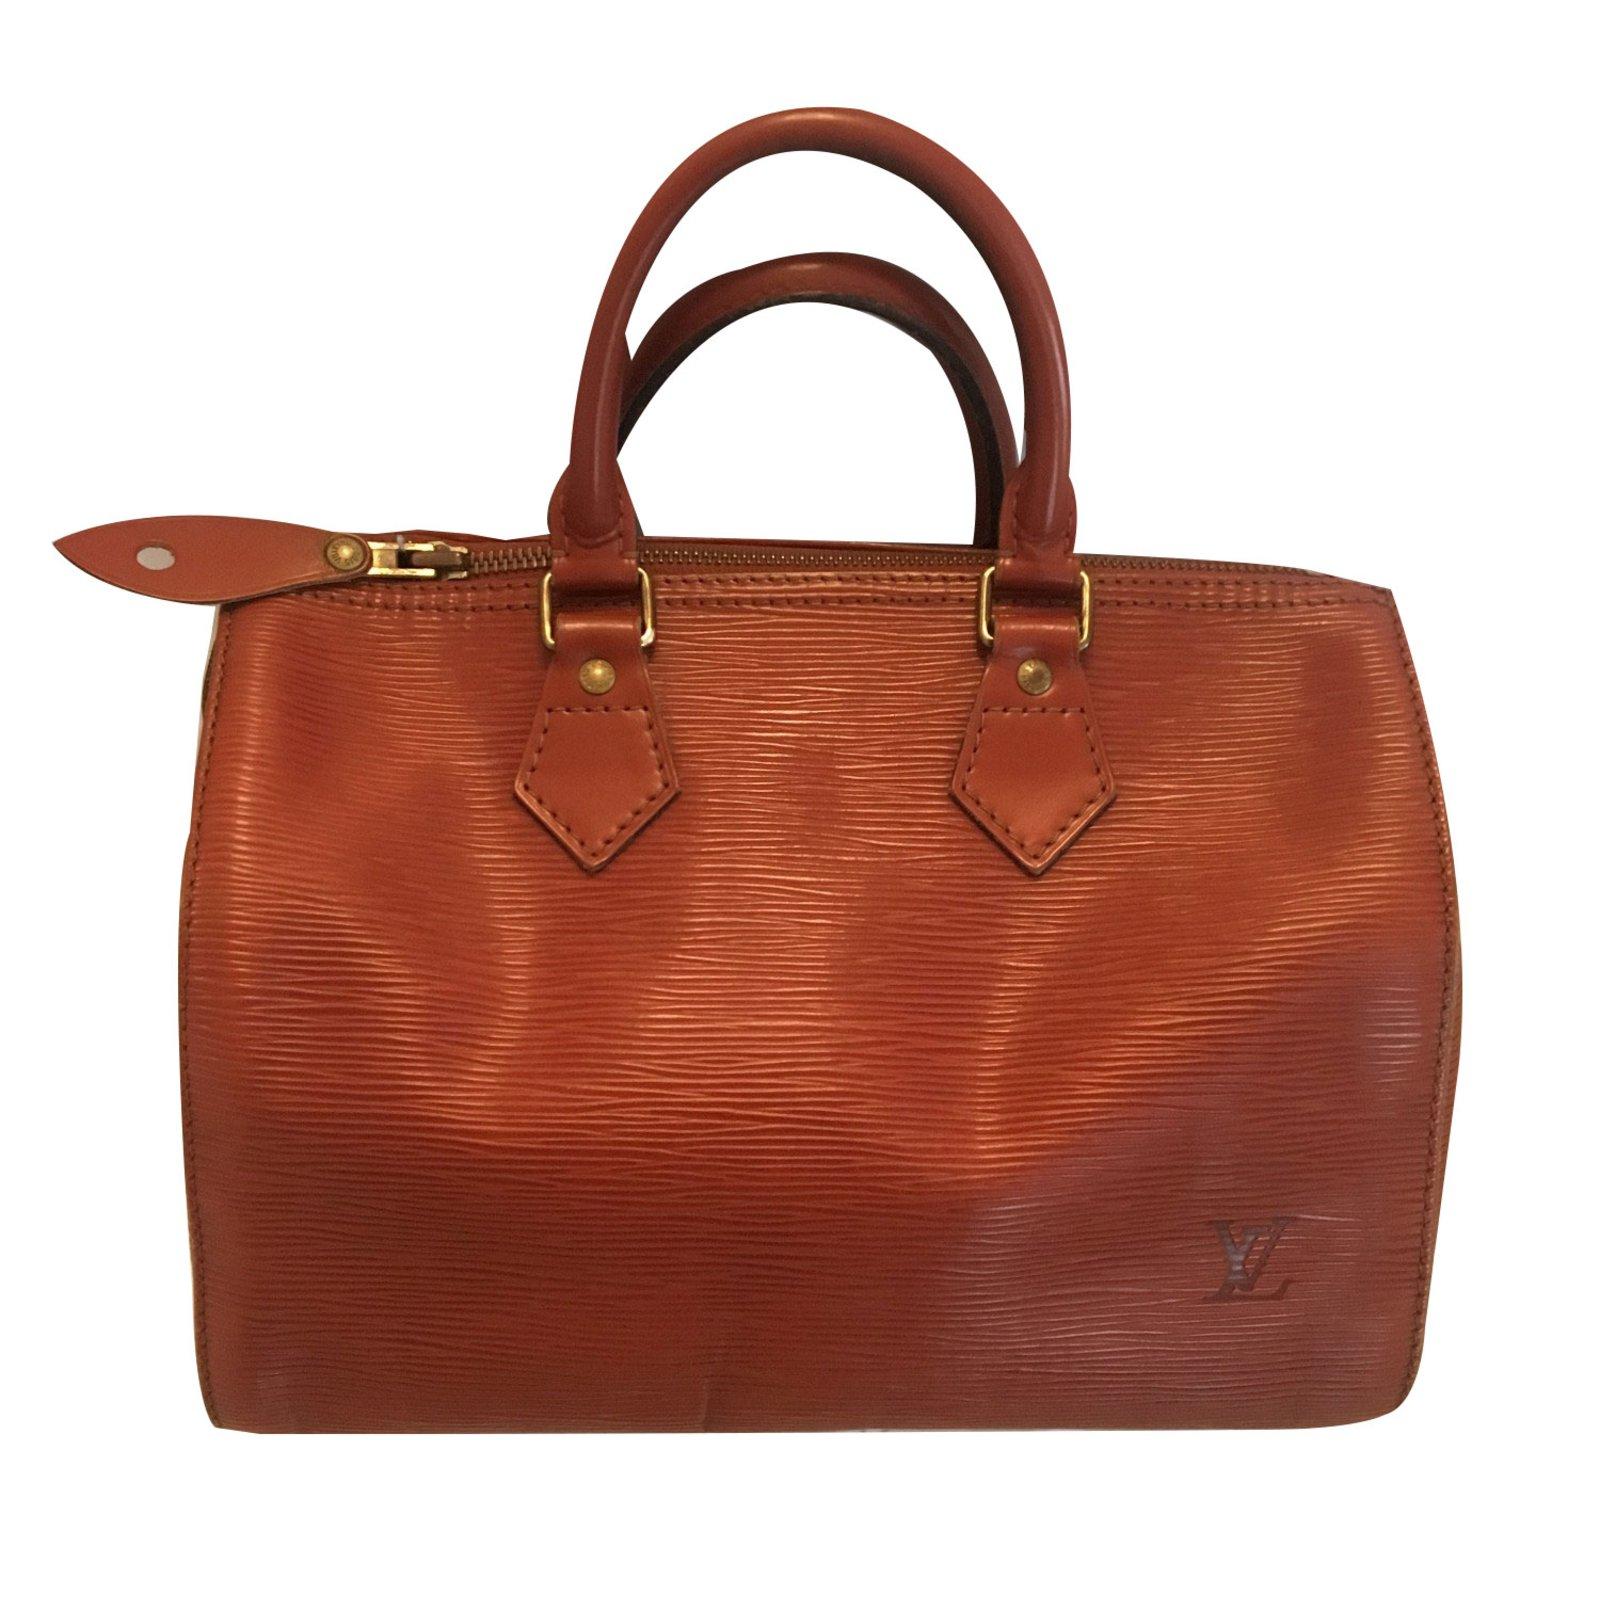 Louis Vuitton Speedy 25 Handbags Leather Light brown ref.74455 ... 550b3dc43d205